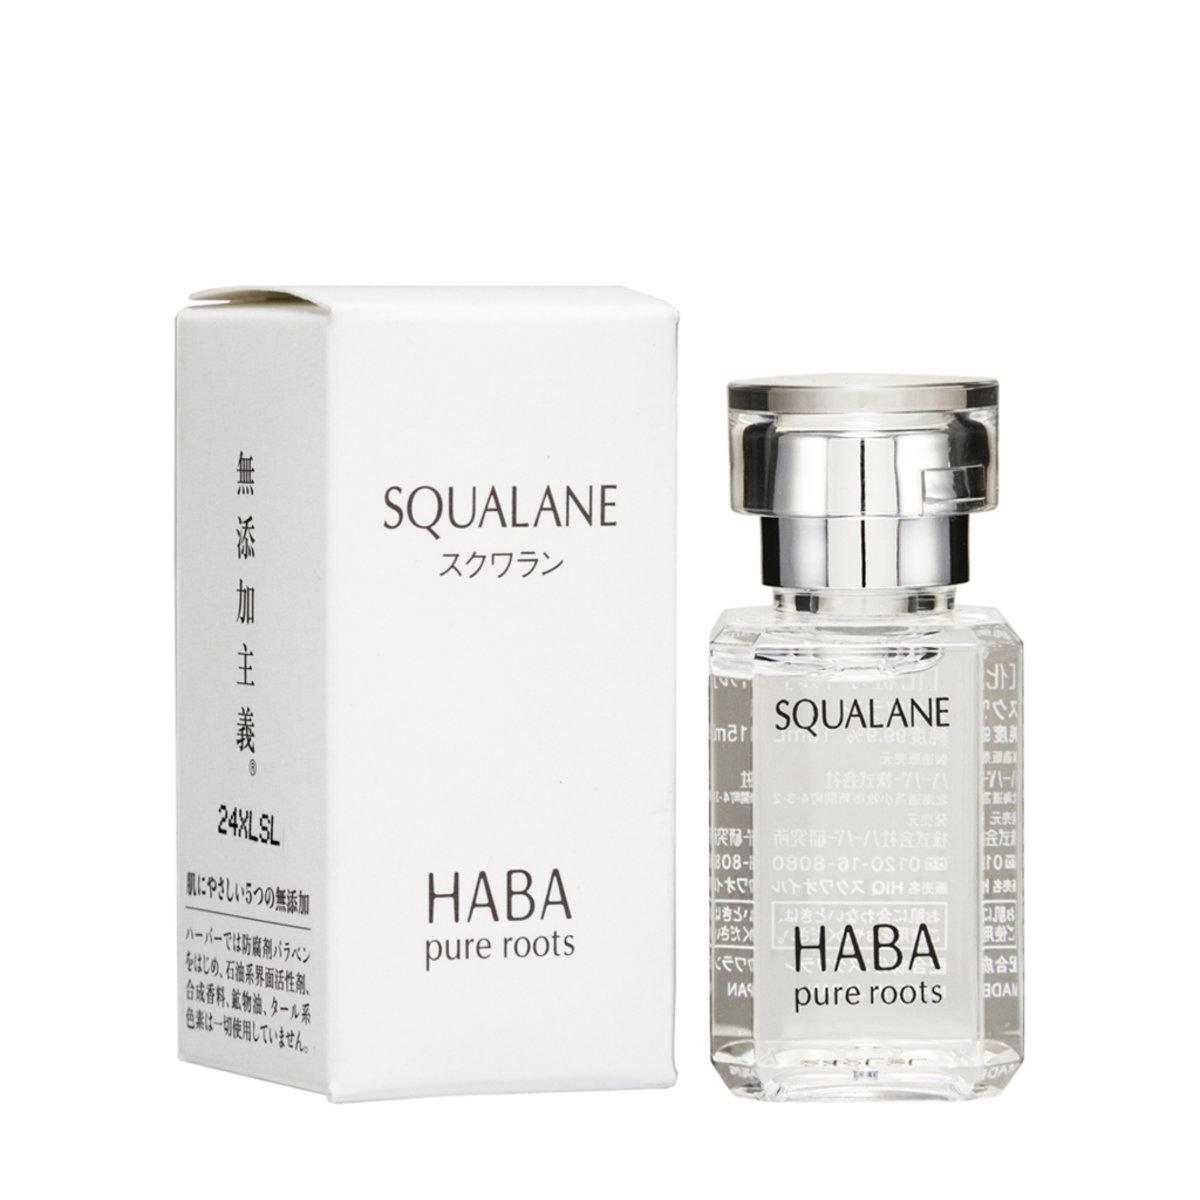 Squalane (15 ml)